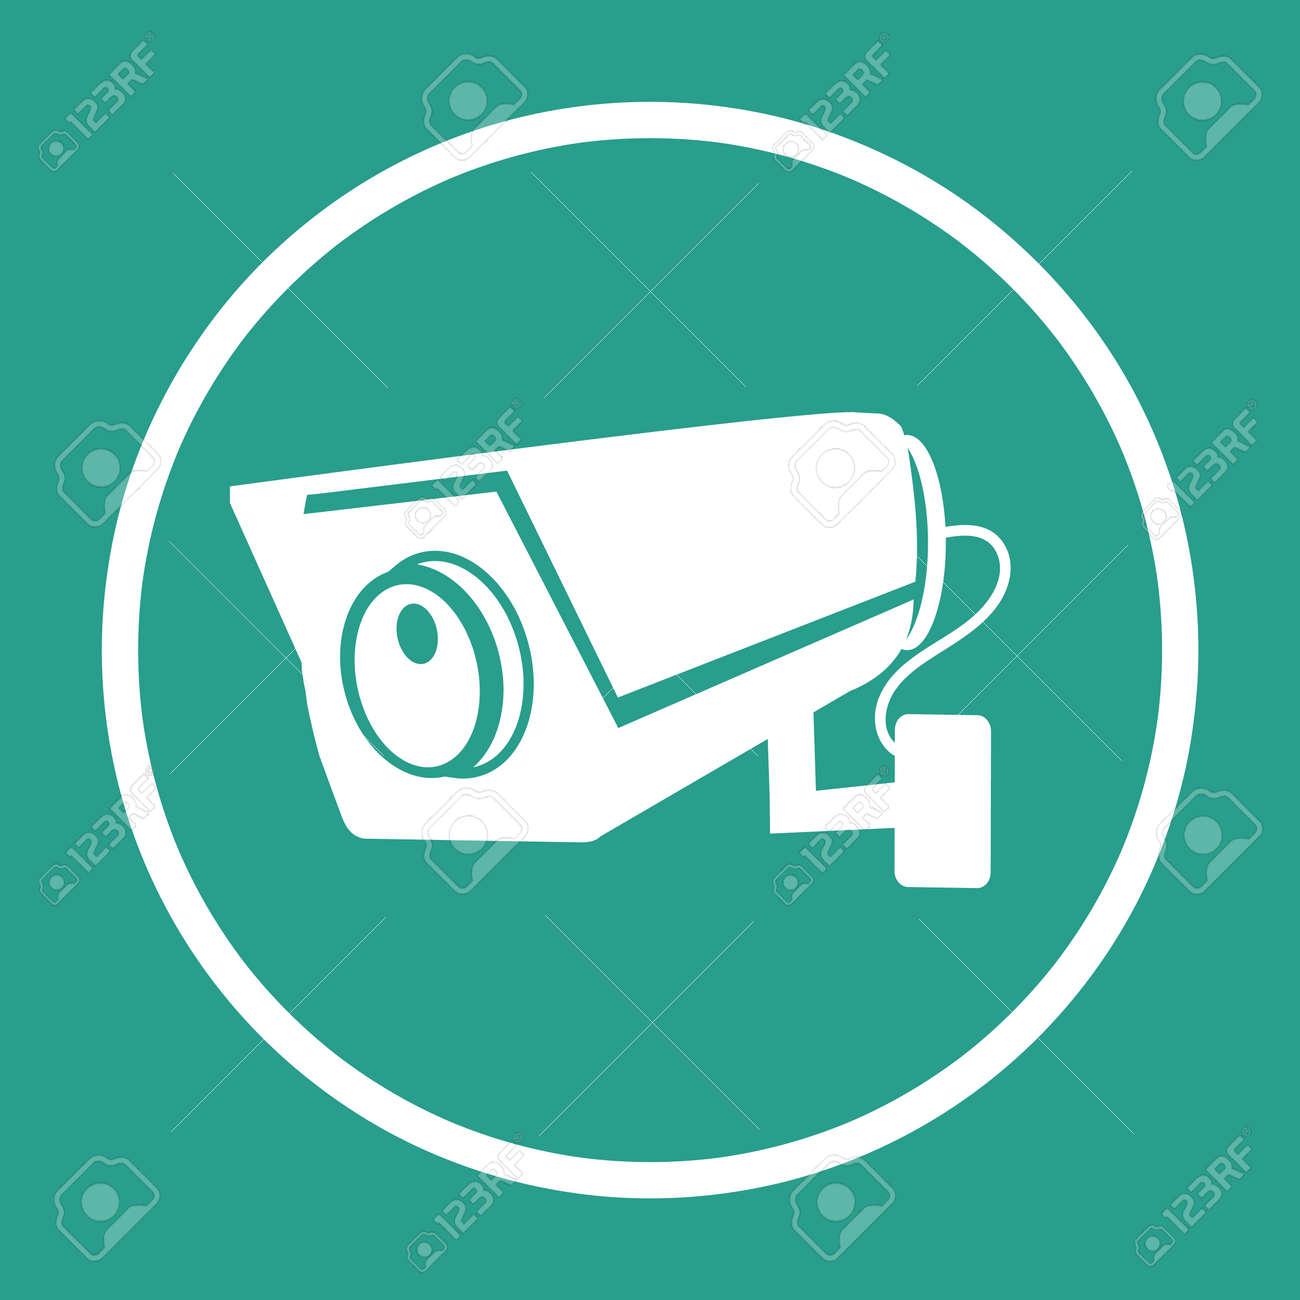 CCTV Security camera flat vector icon sign - 168920288